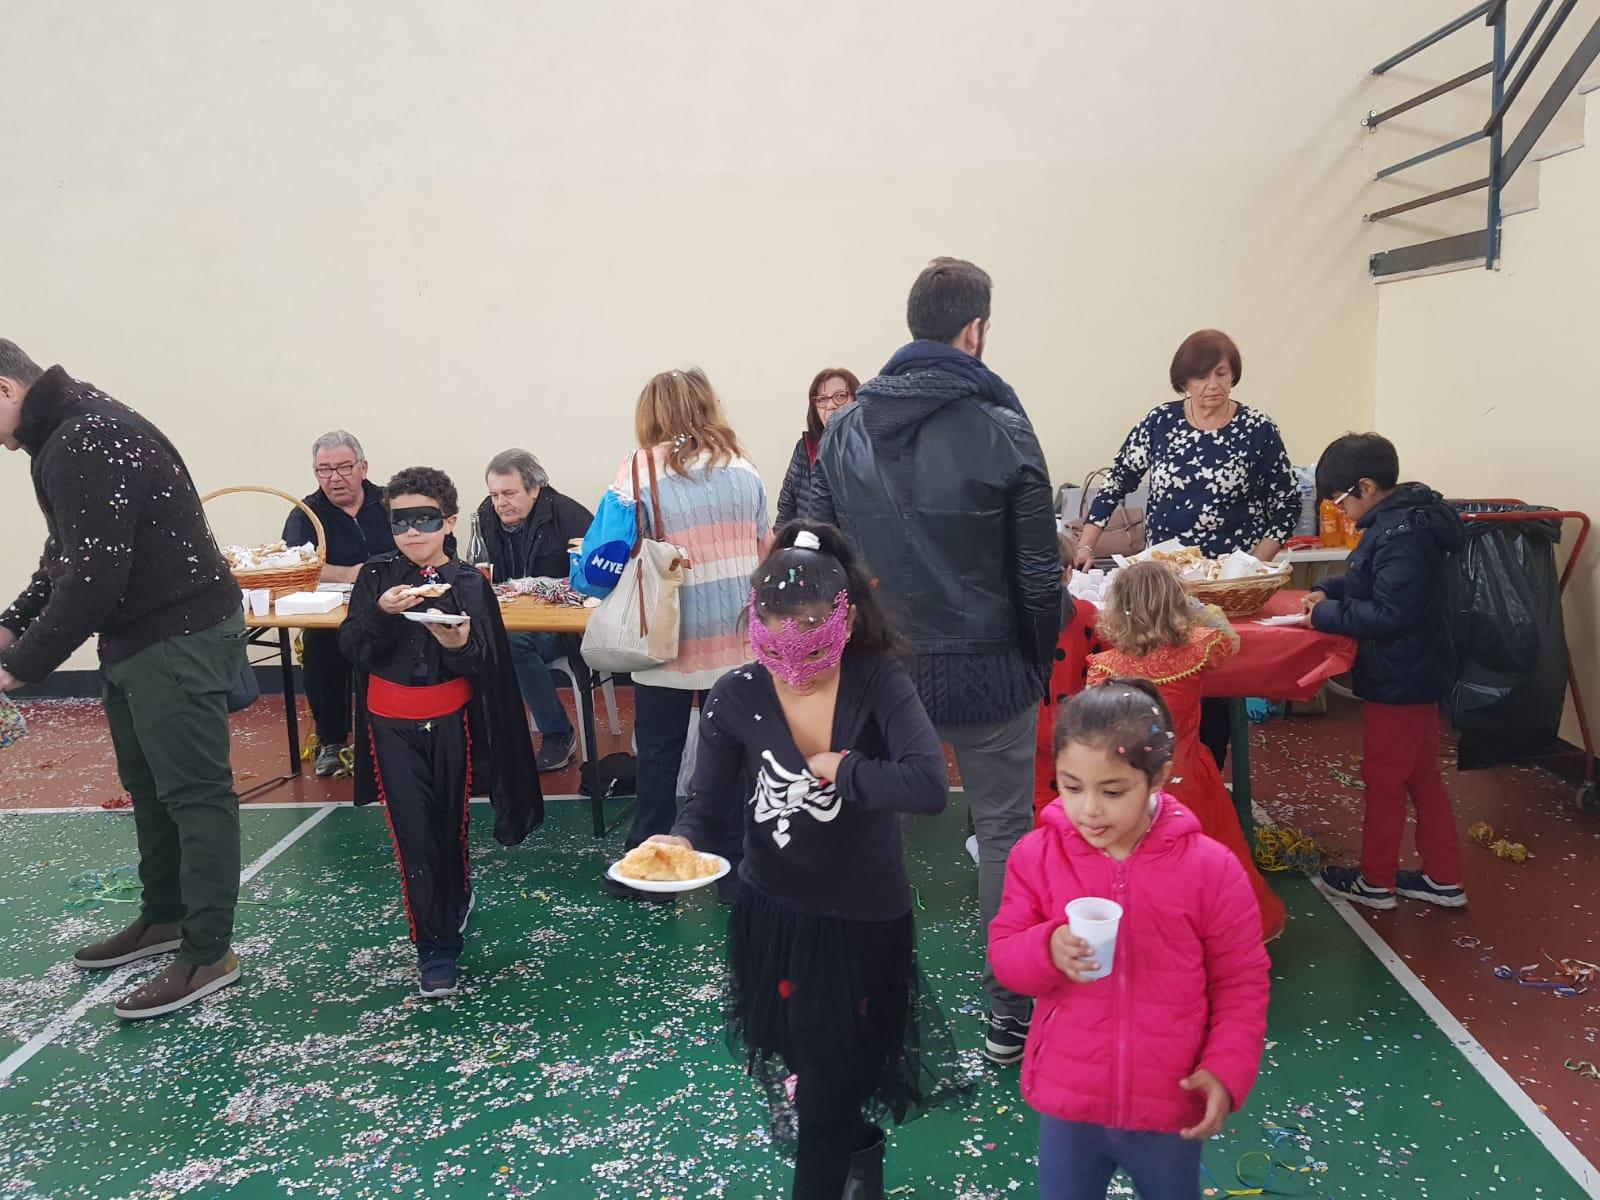 Baraonda Carnevale 2019 (111)